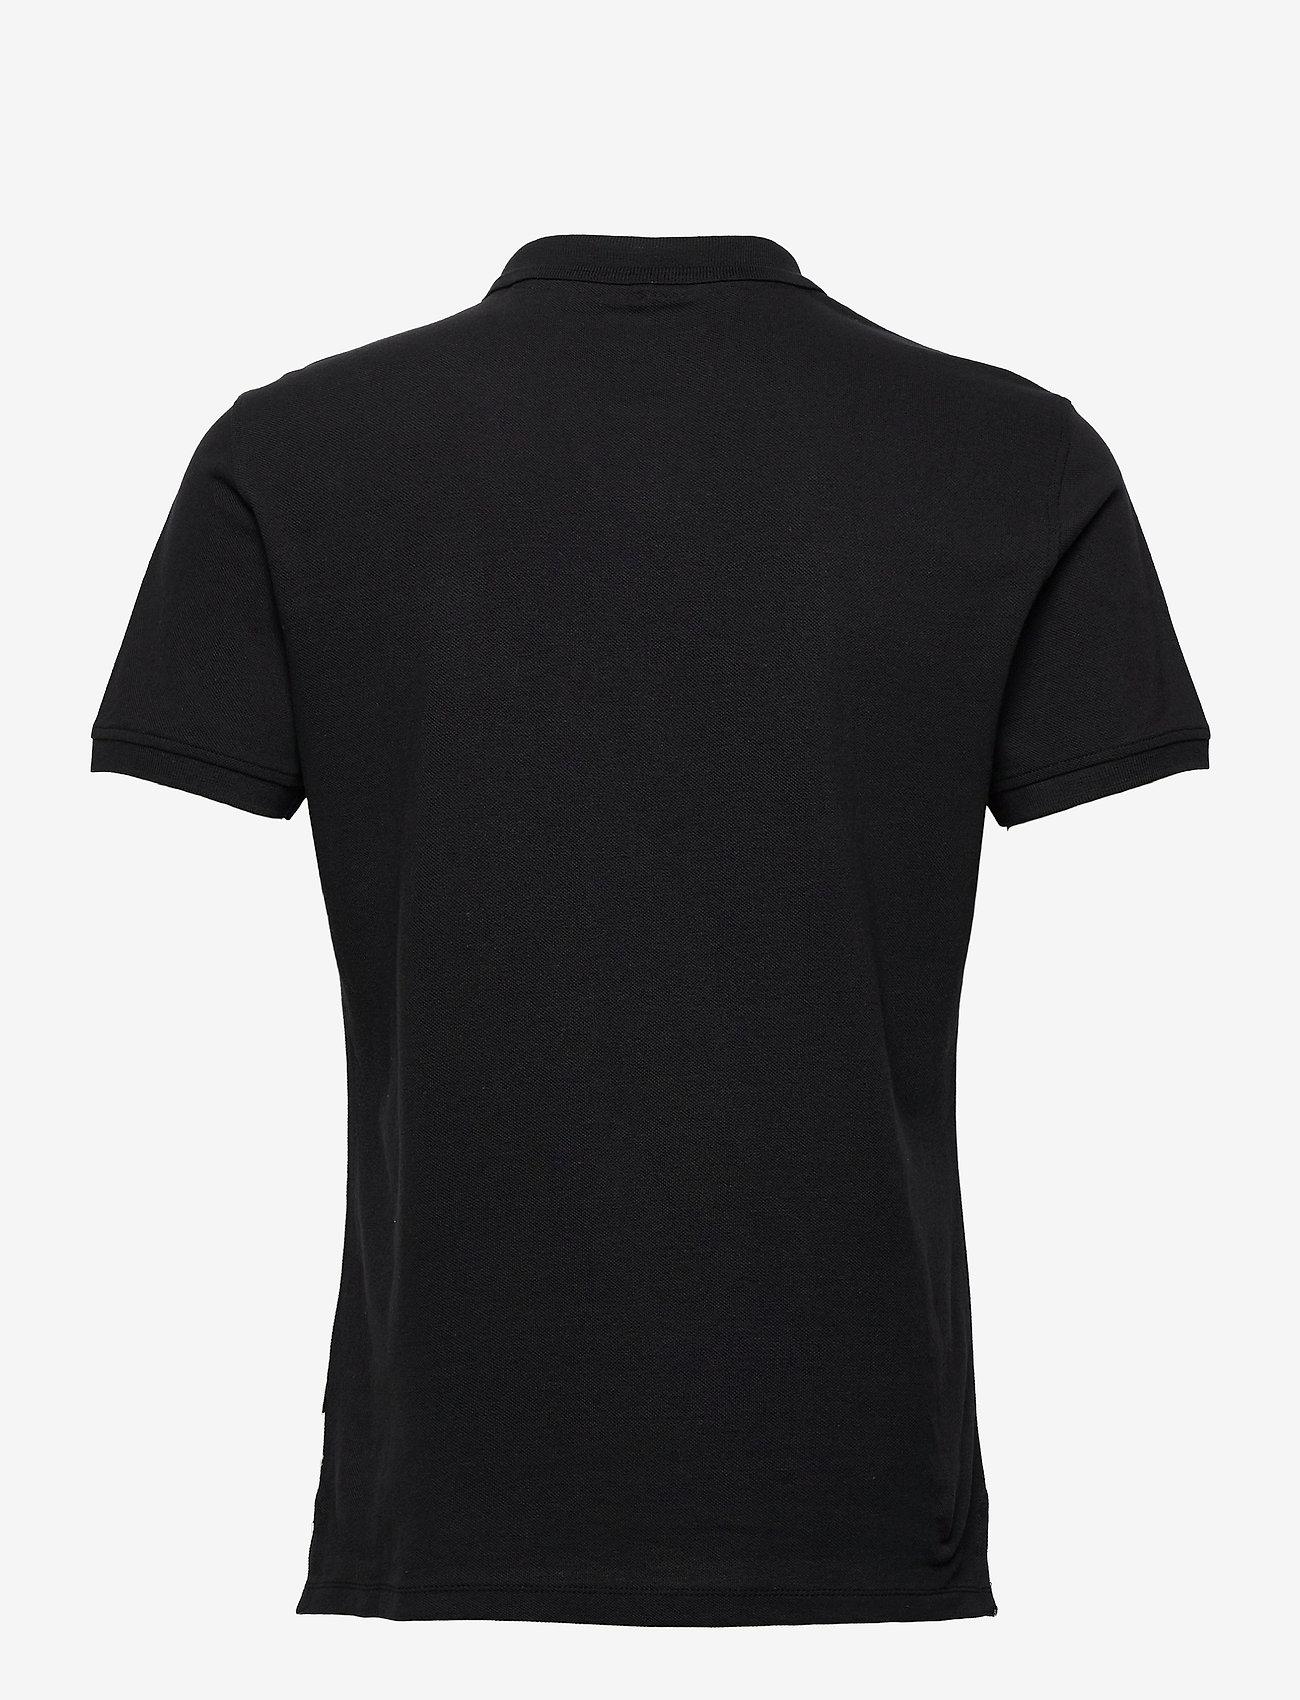 Blend - Poloshirt - poloshirts - black - 1